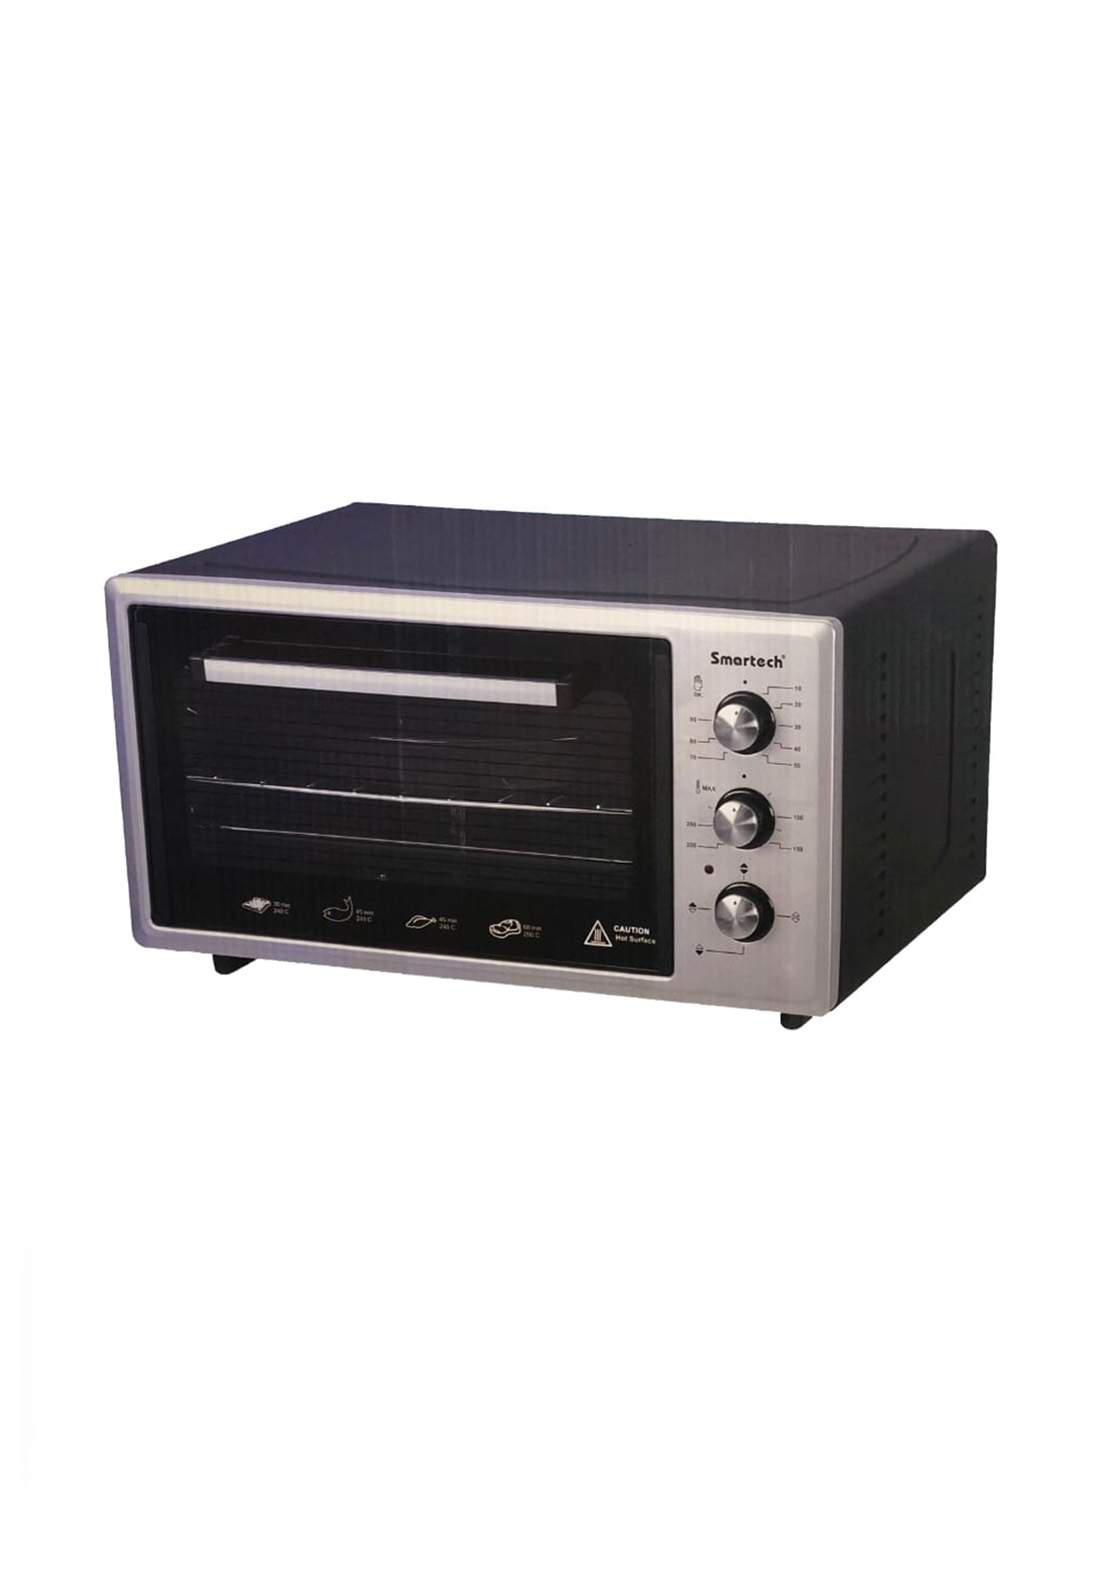 Smartech 448 Oven  فرن كهربائي